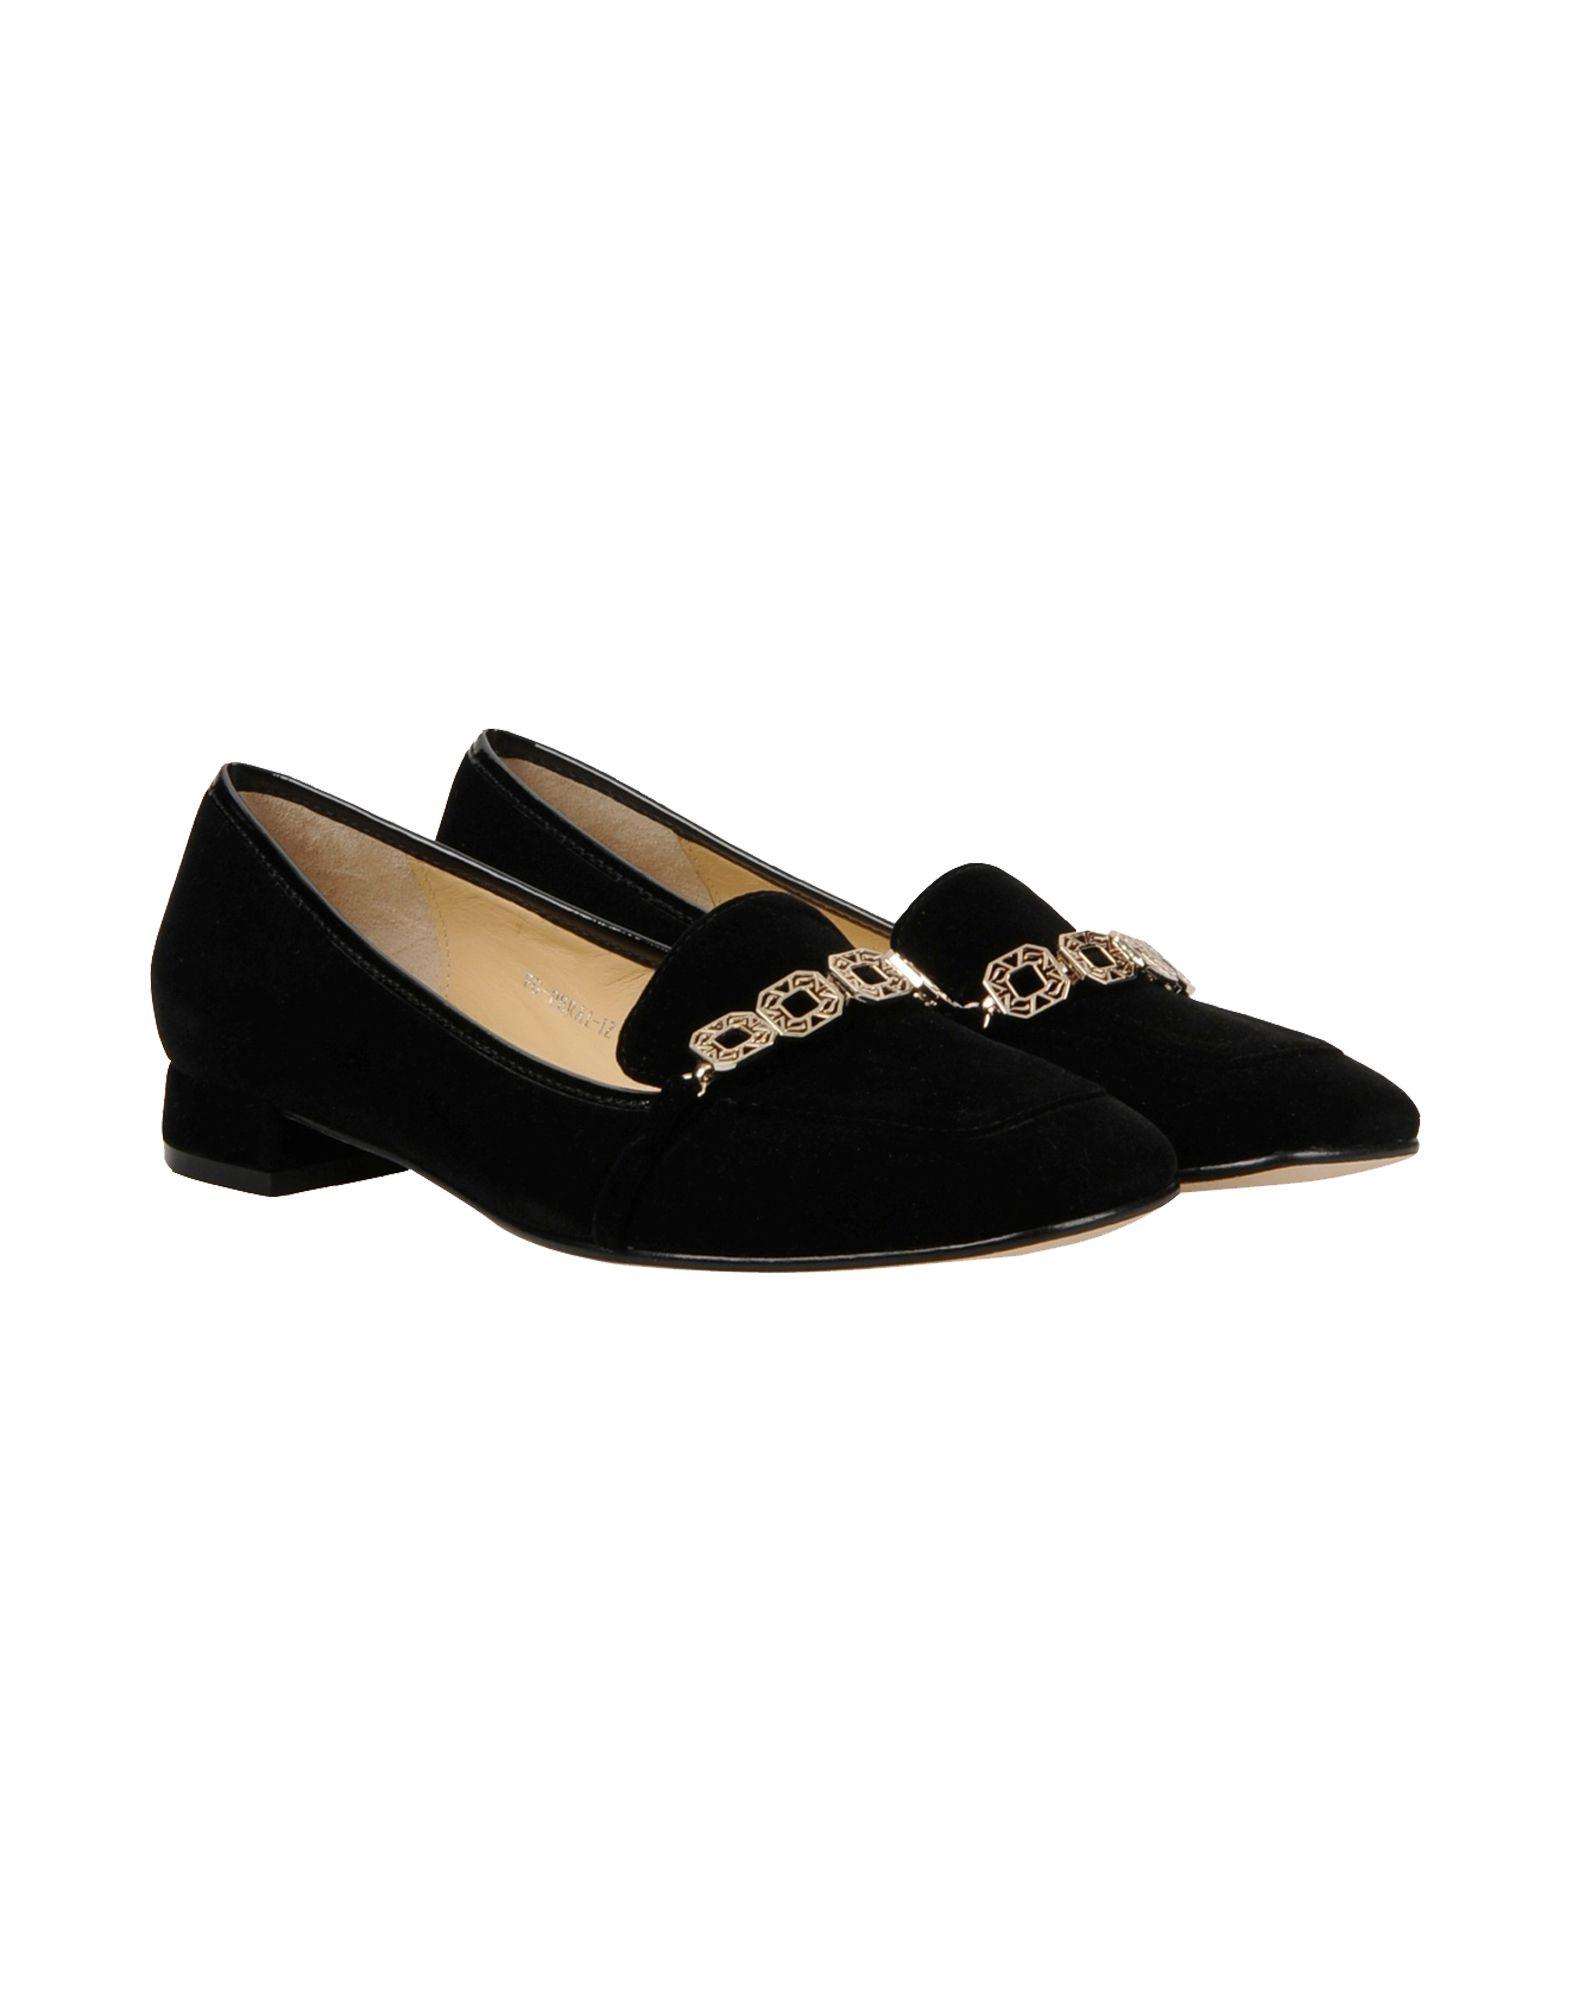 Carlo Pazolini Mokassins Qualität Damen  44686831VX Gute Qualität Mokassins beliebte Schuhe 62ae11